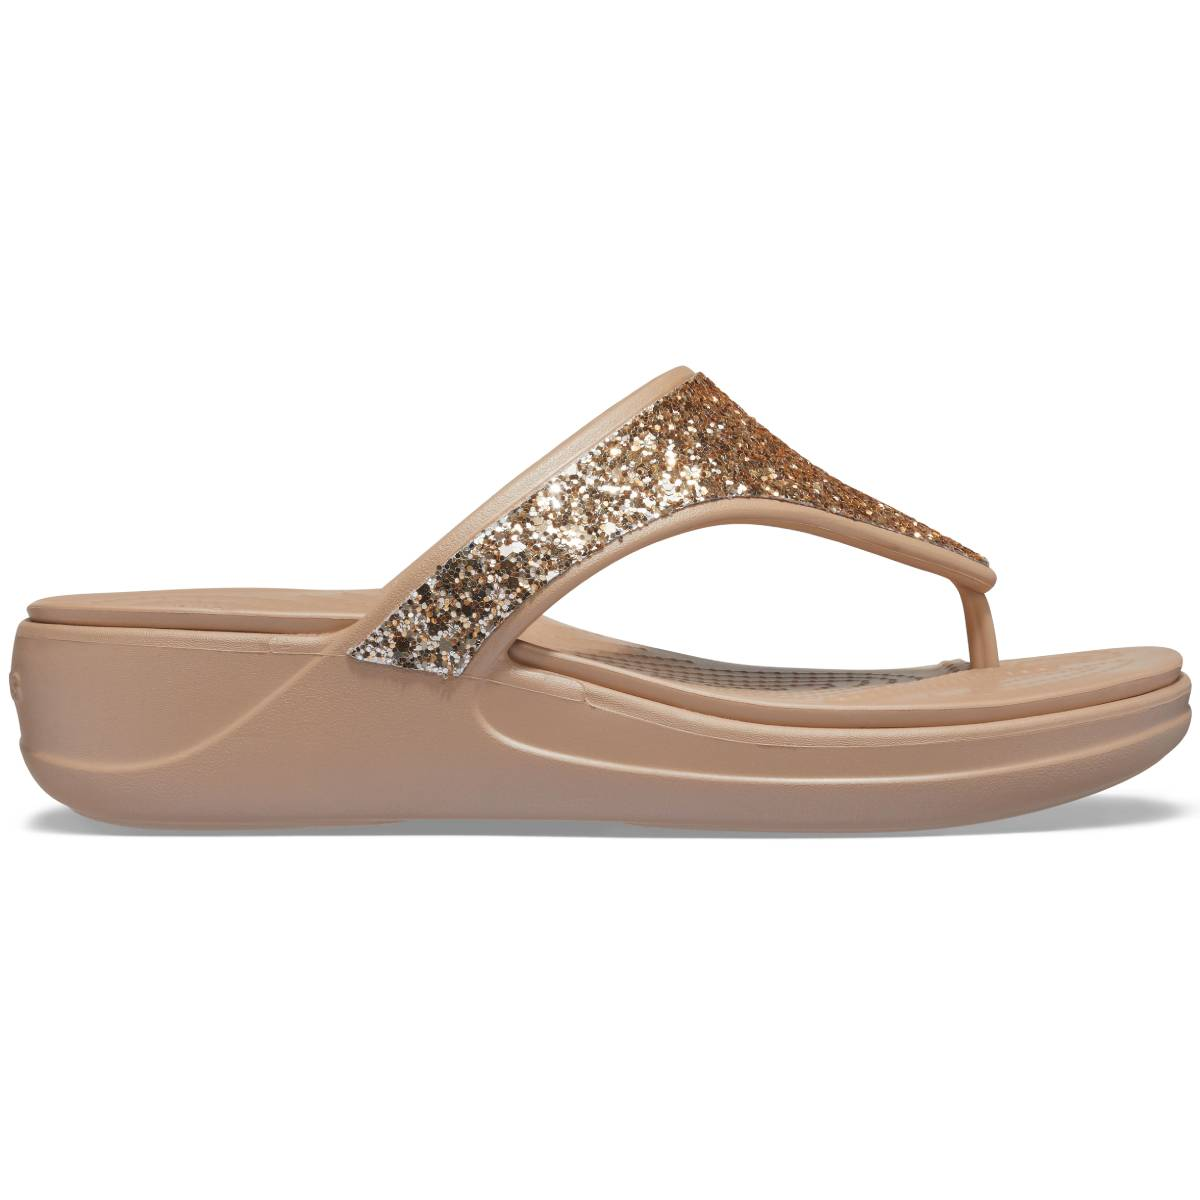 Crocs Monterey Glitter WgFp - Altın